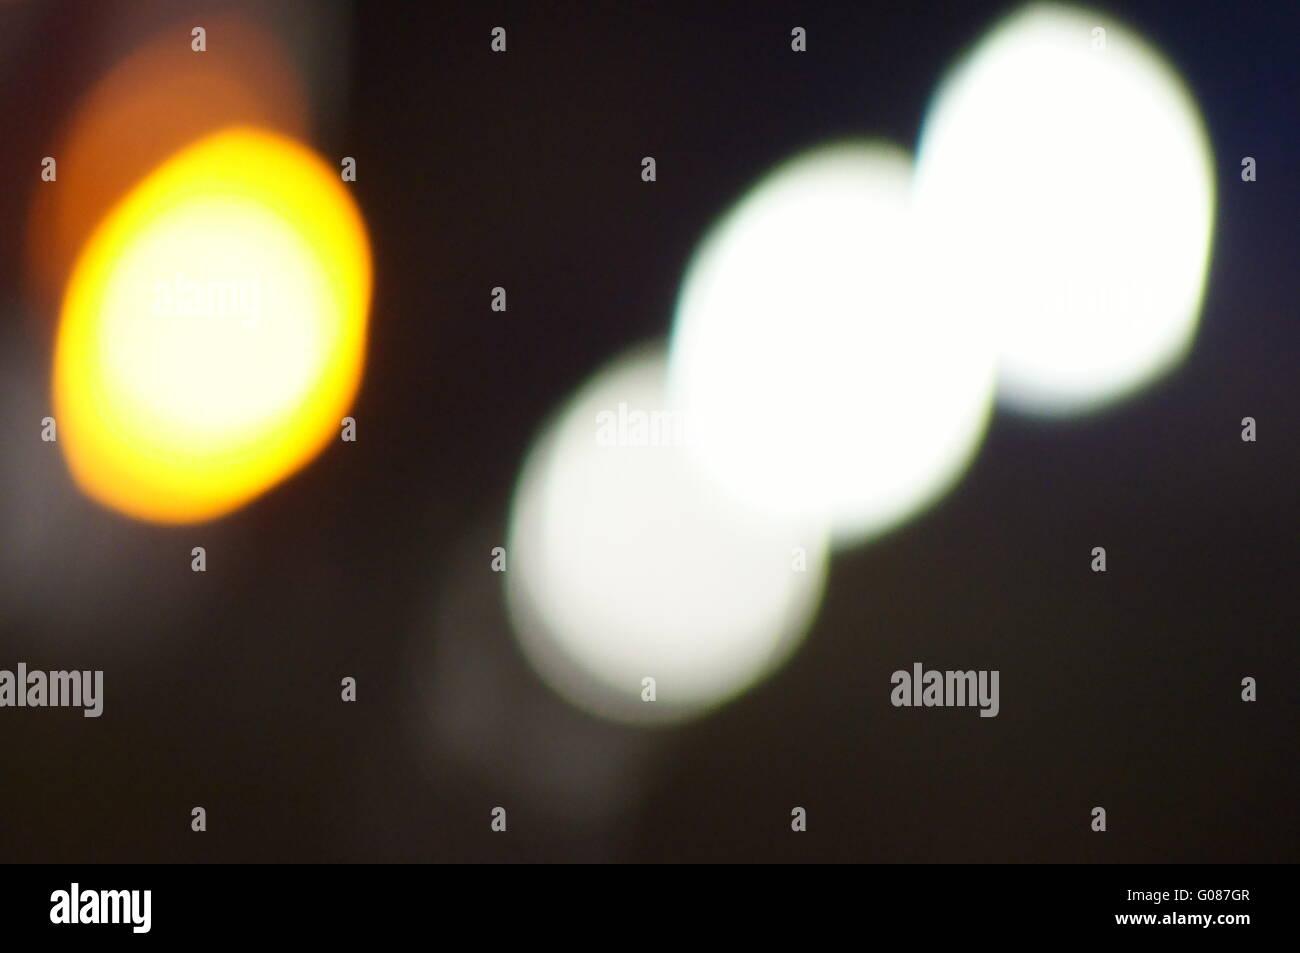 Traffic Light Abtract - Stock Image